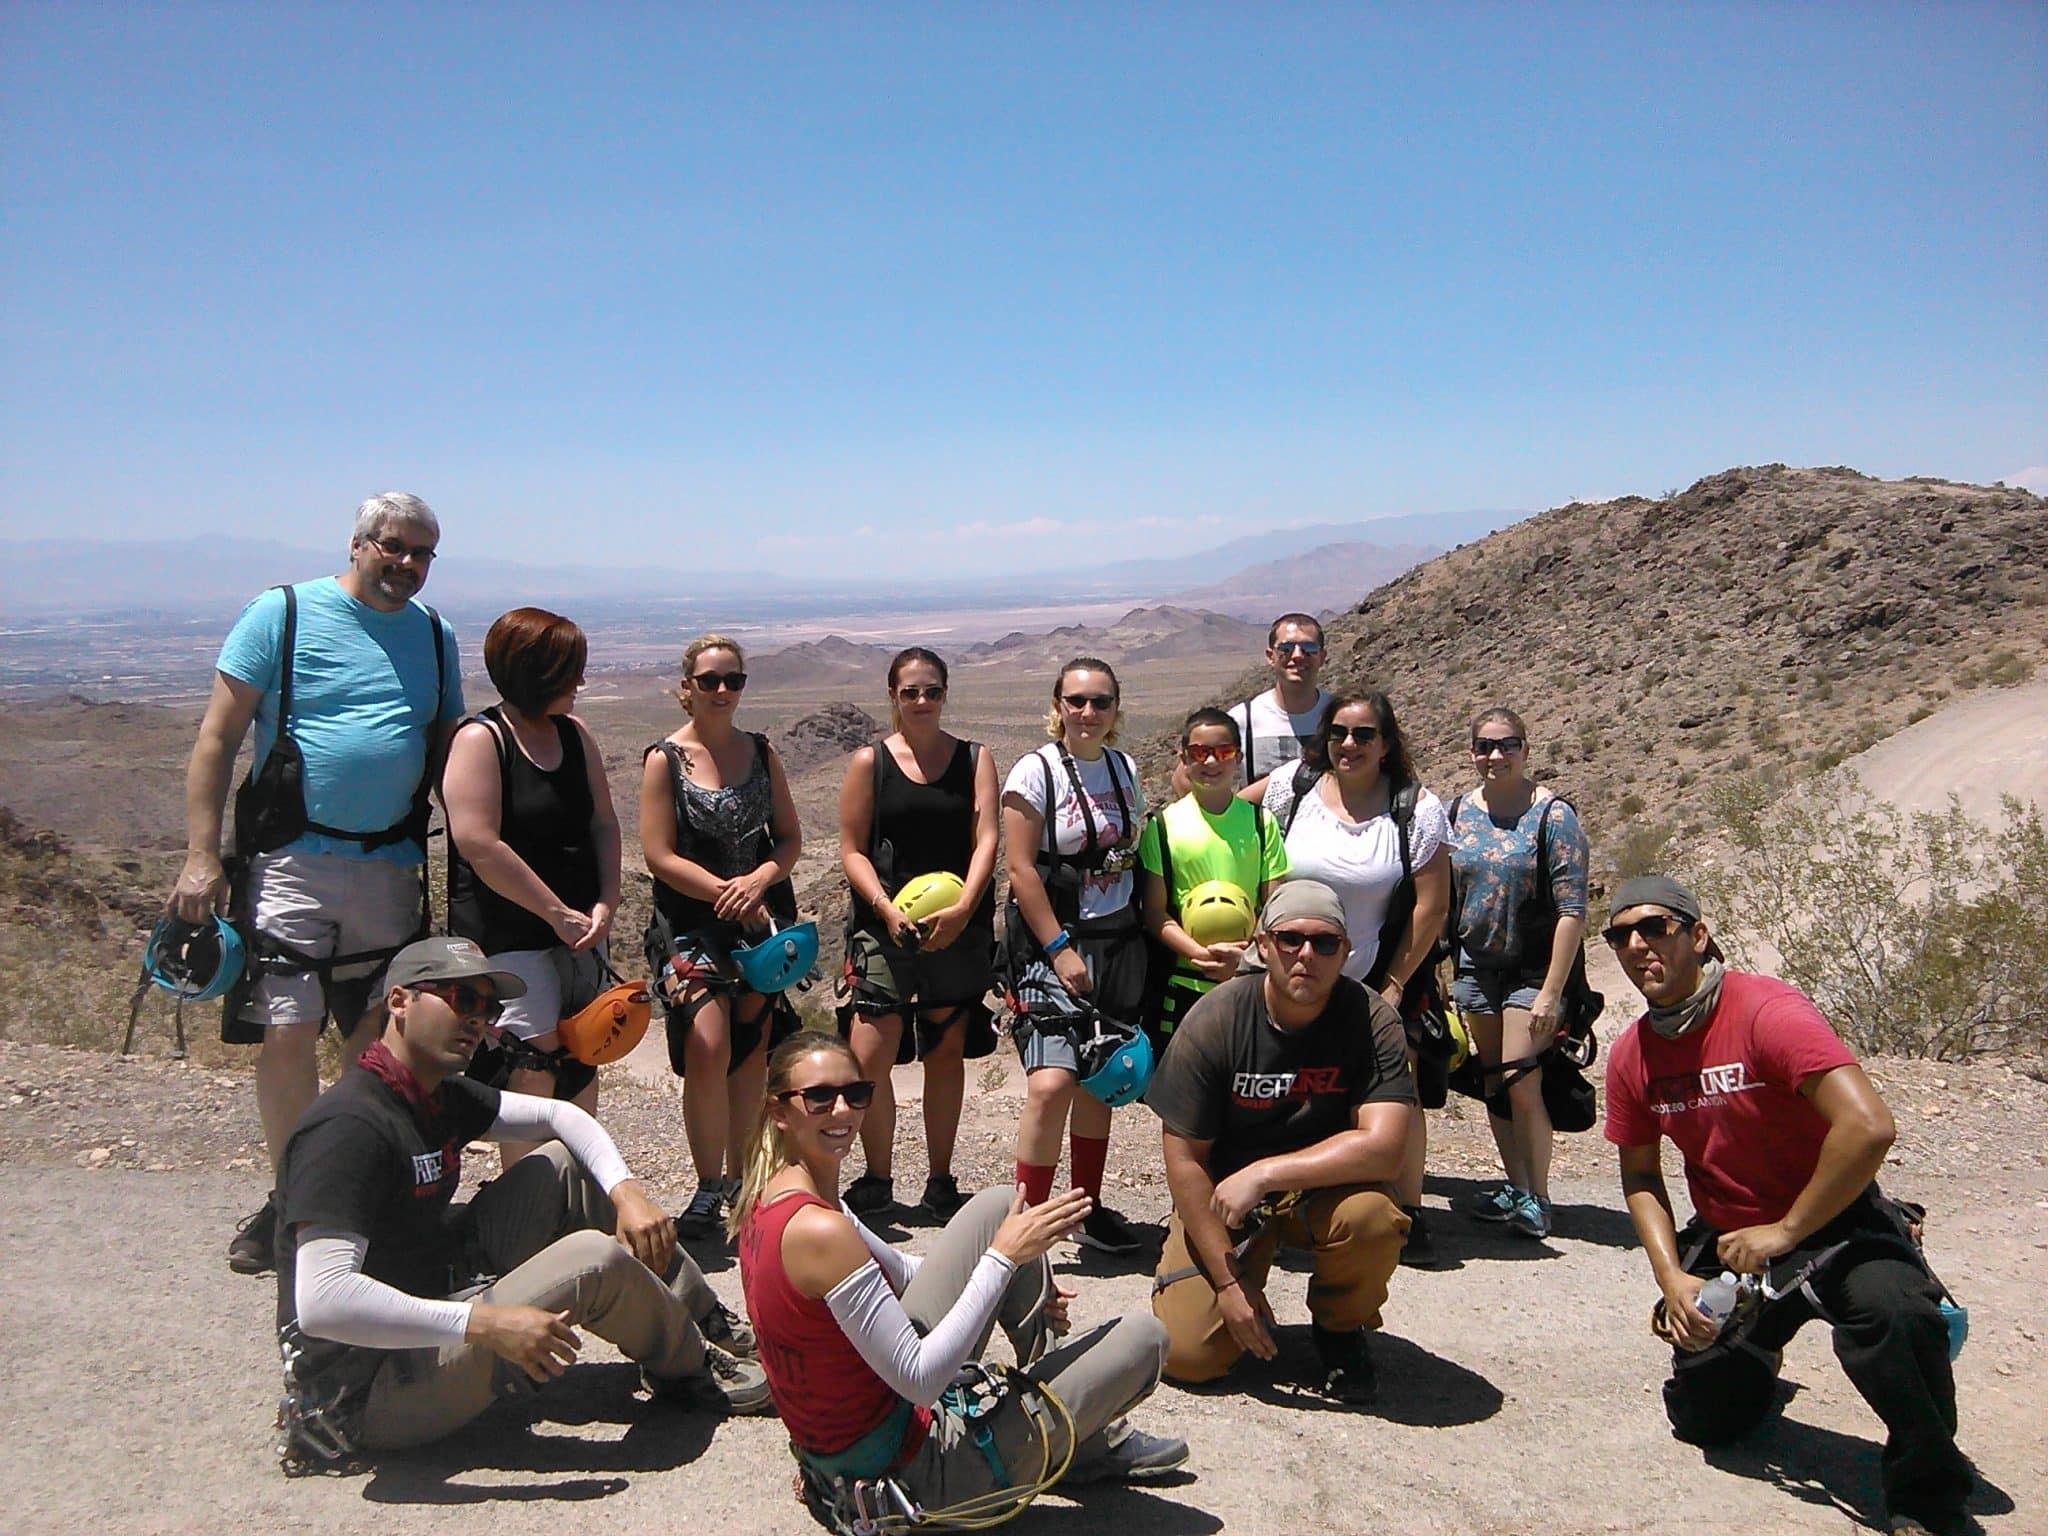 Zip line over the Mojave Desert with @FlightlinezBC #Hosted @USFG